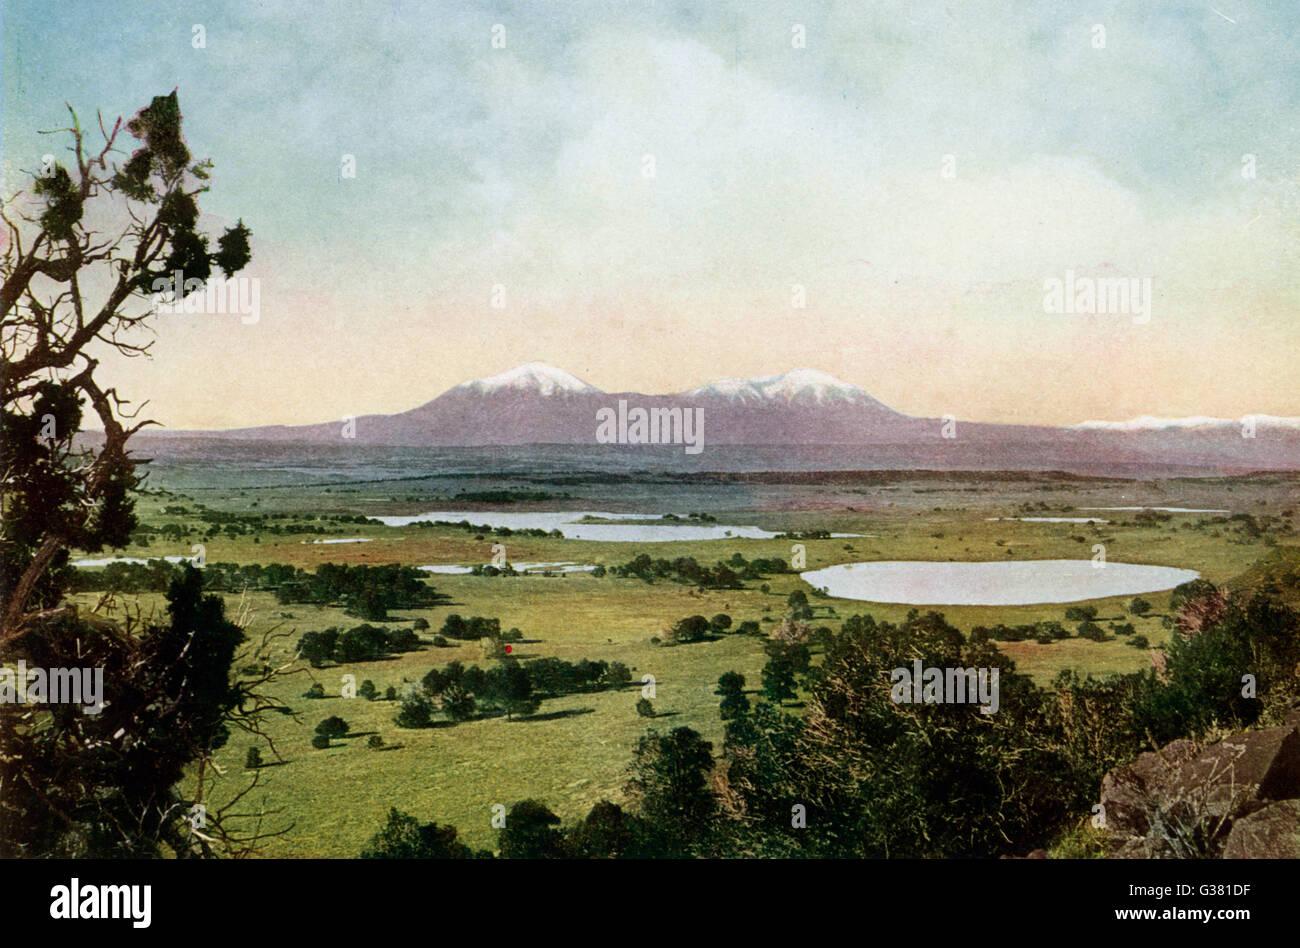 Rocky Mountains,  Colorado        Date: 1923 - Stock Image